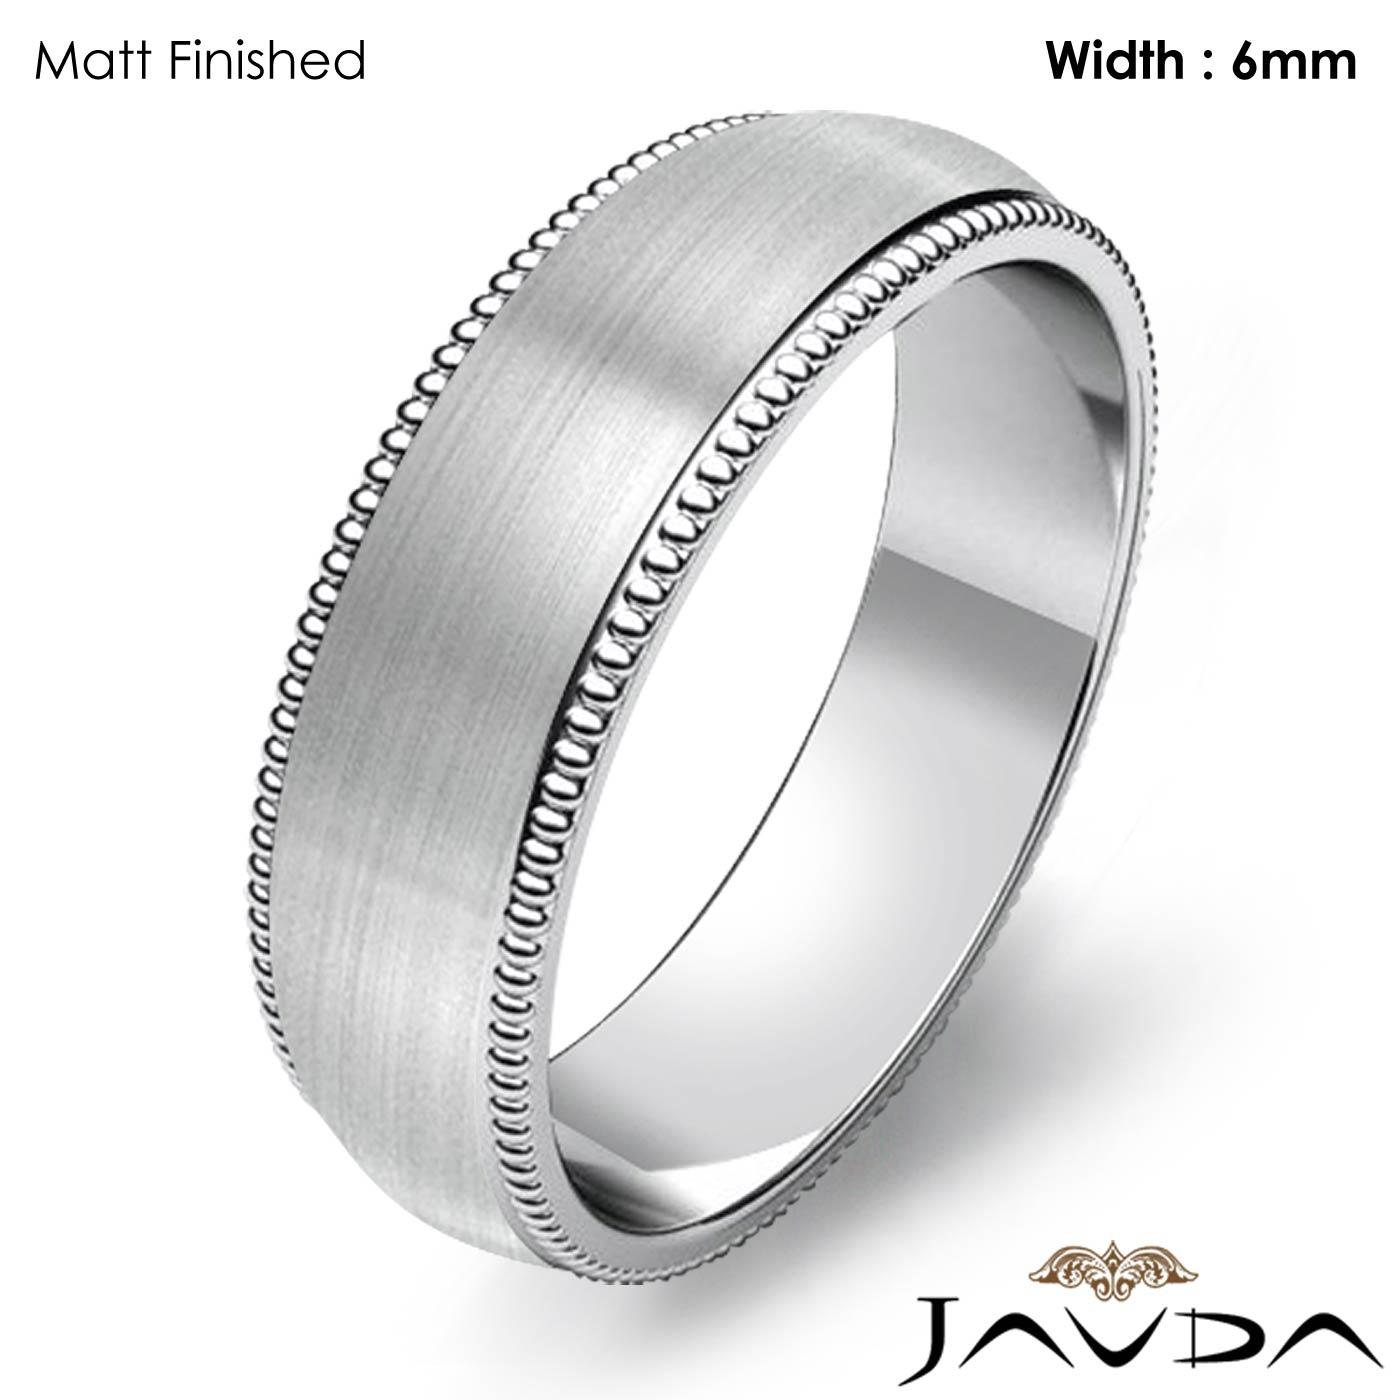 Platinum Double Milgrain 6mm Wide Flat Wedding Band Ring: Solid Men Wedding Band Dome Milgrain Edge Ring 6mm 14k